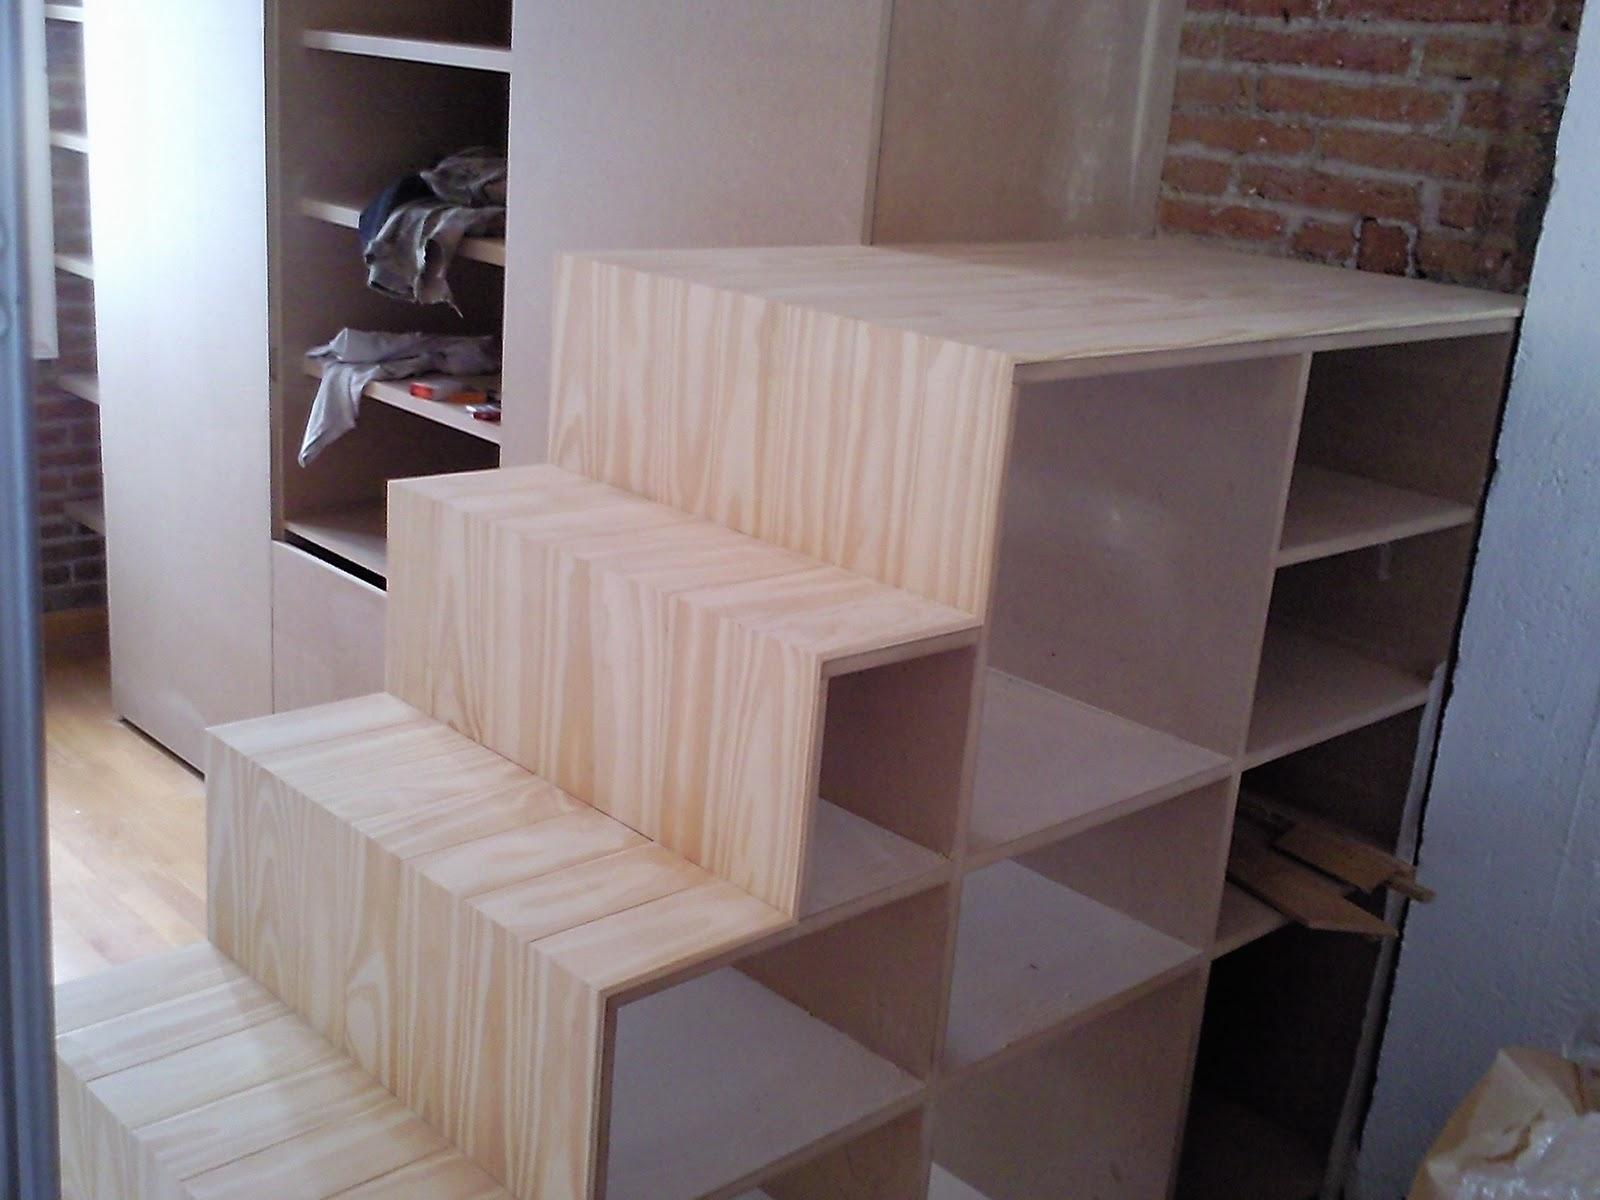 Carpinteria loren comedor con escalera altillo for Escaleras para altillo